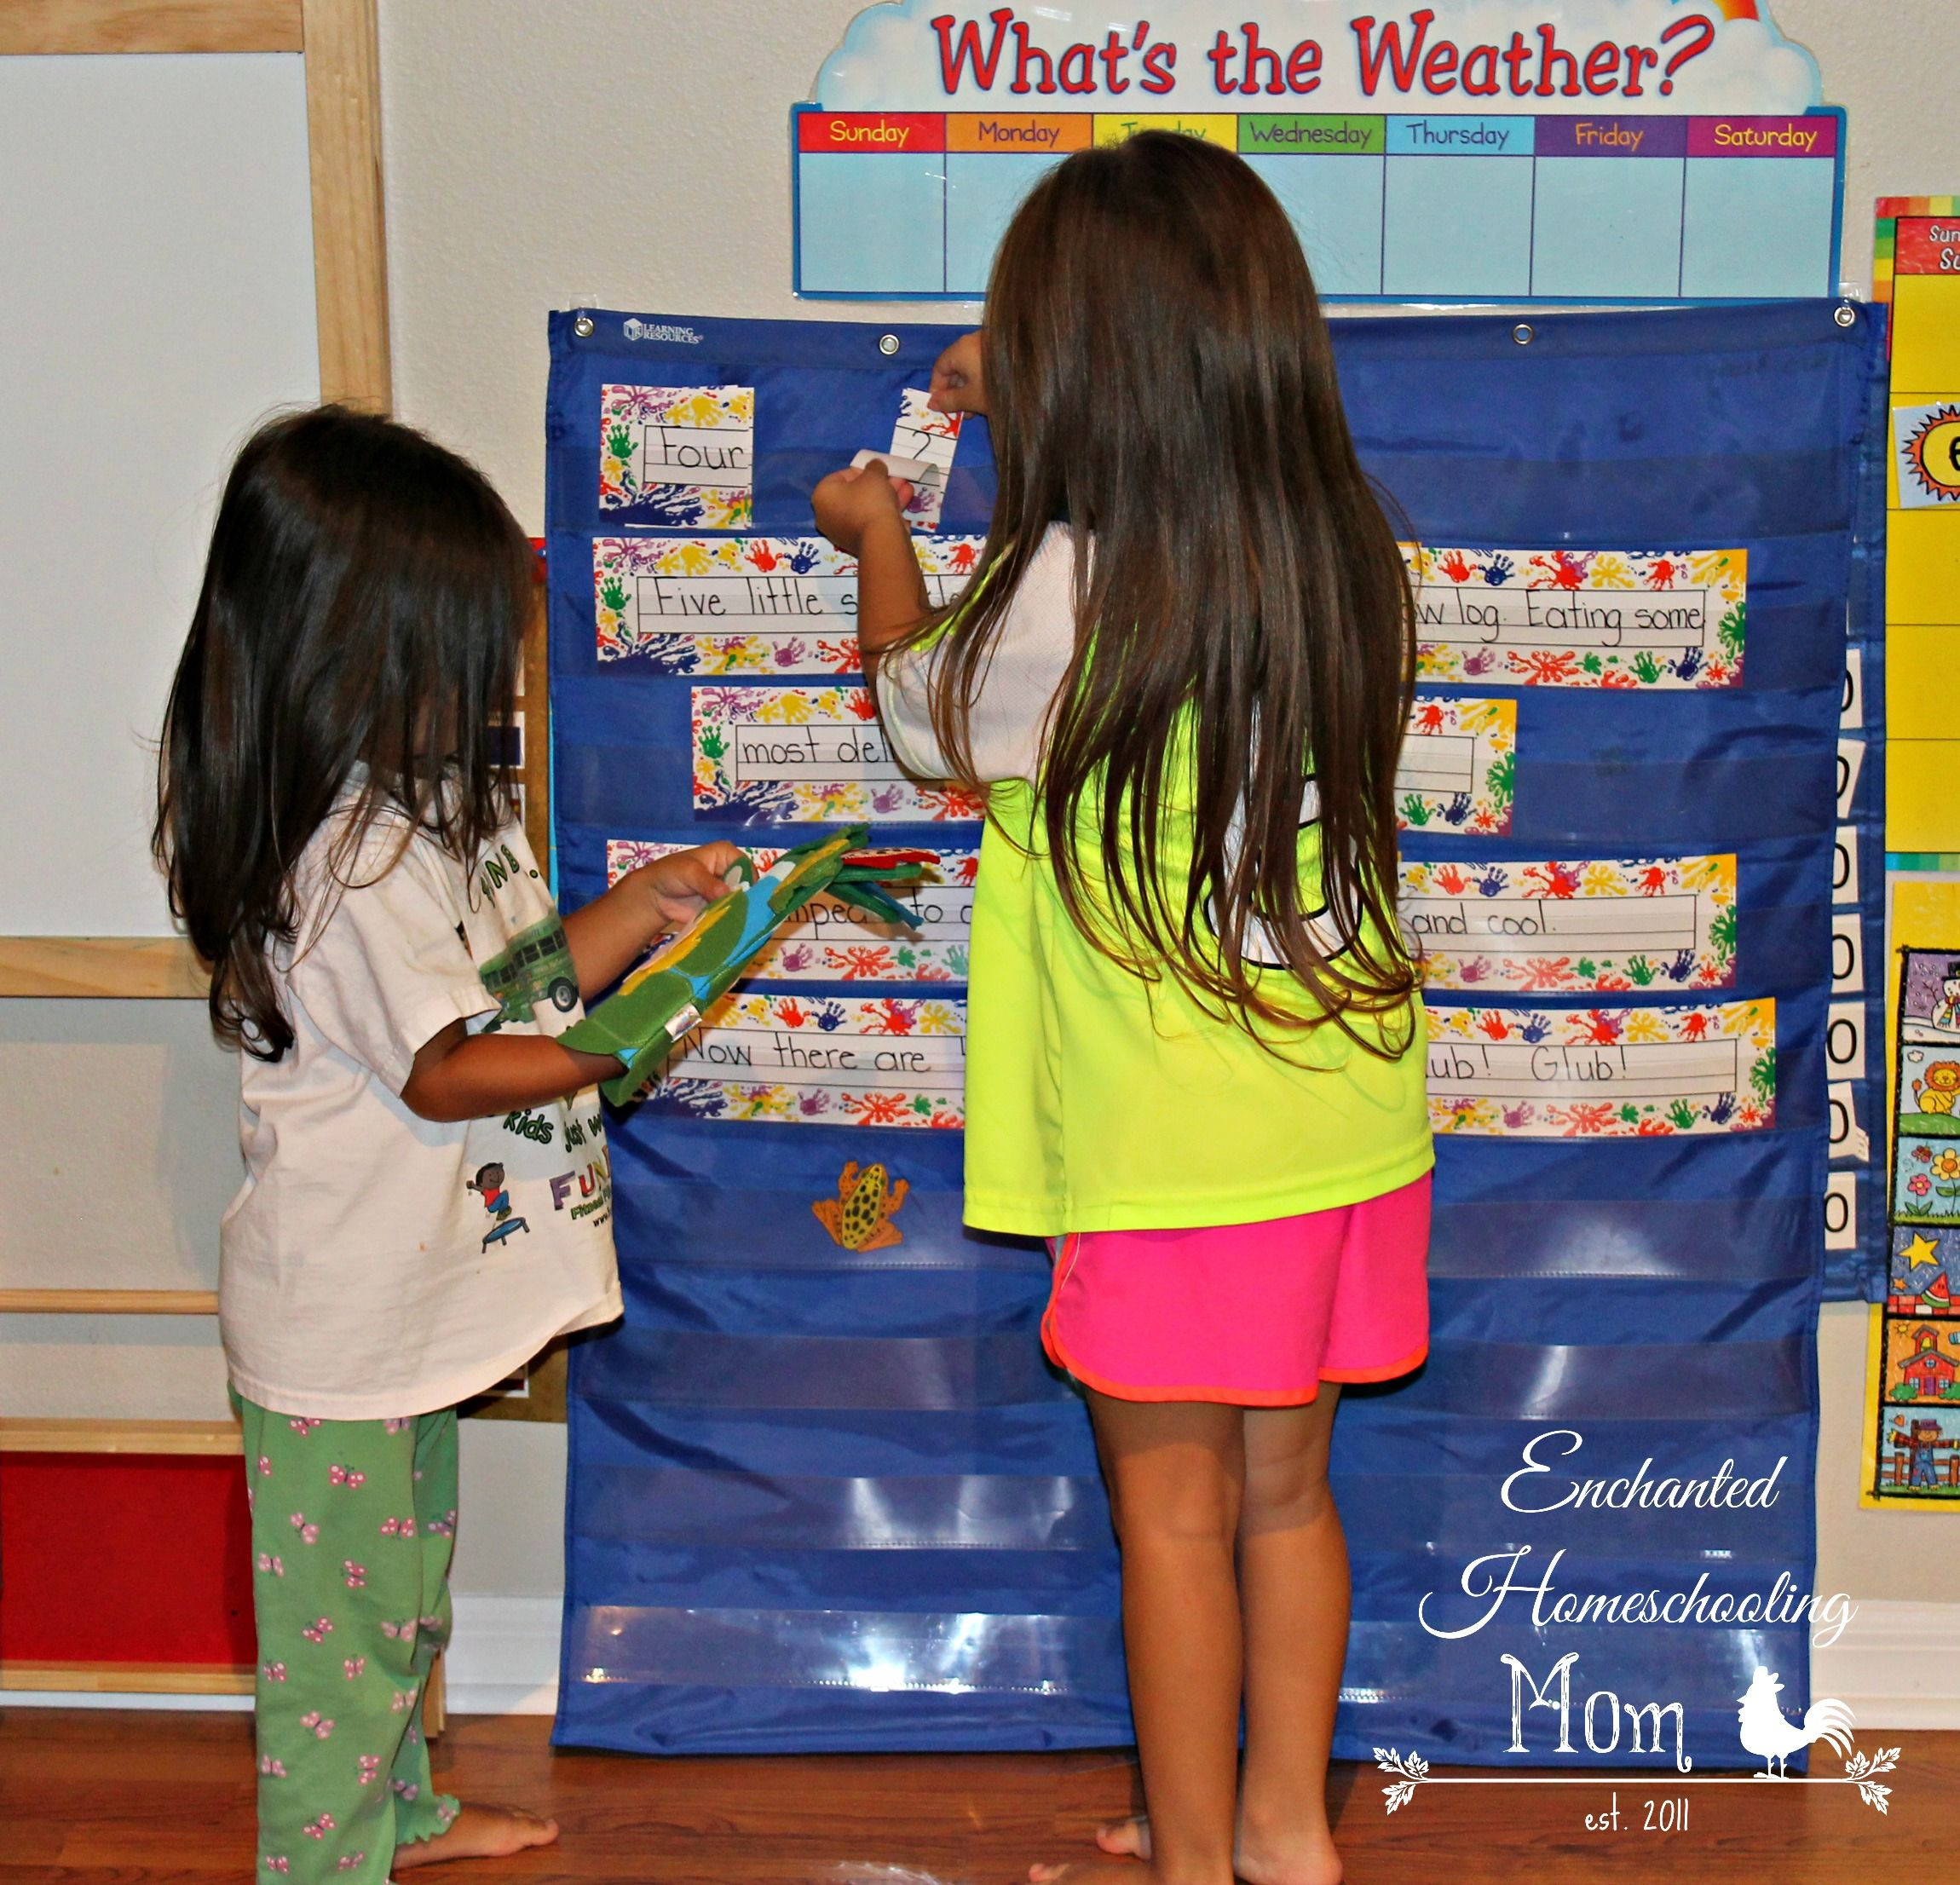 Pocket Charts & Music Finger Play - Enchanted Homeschooling Mom